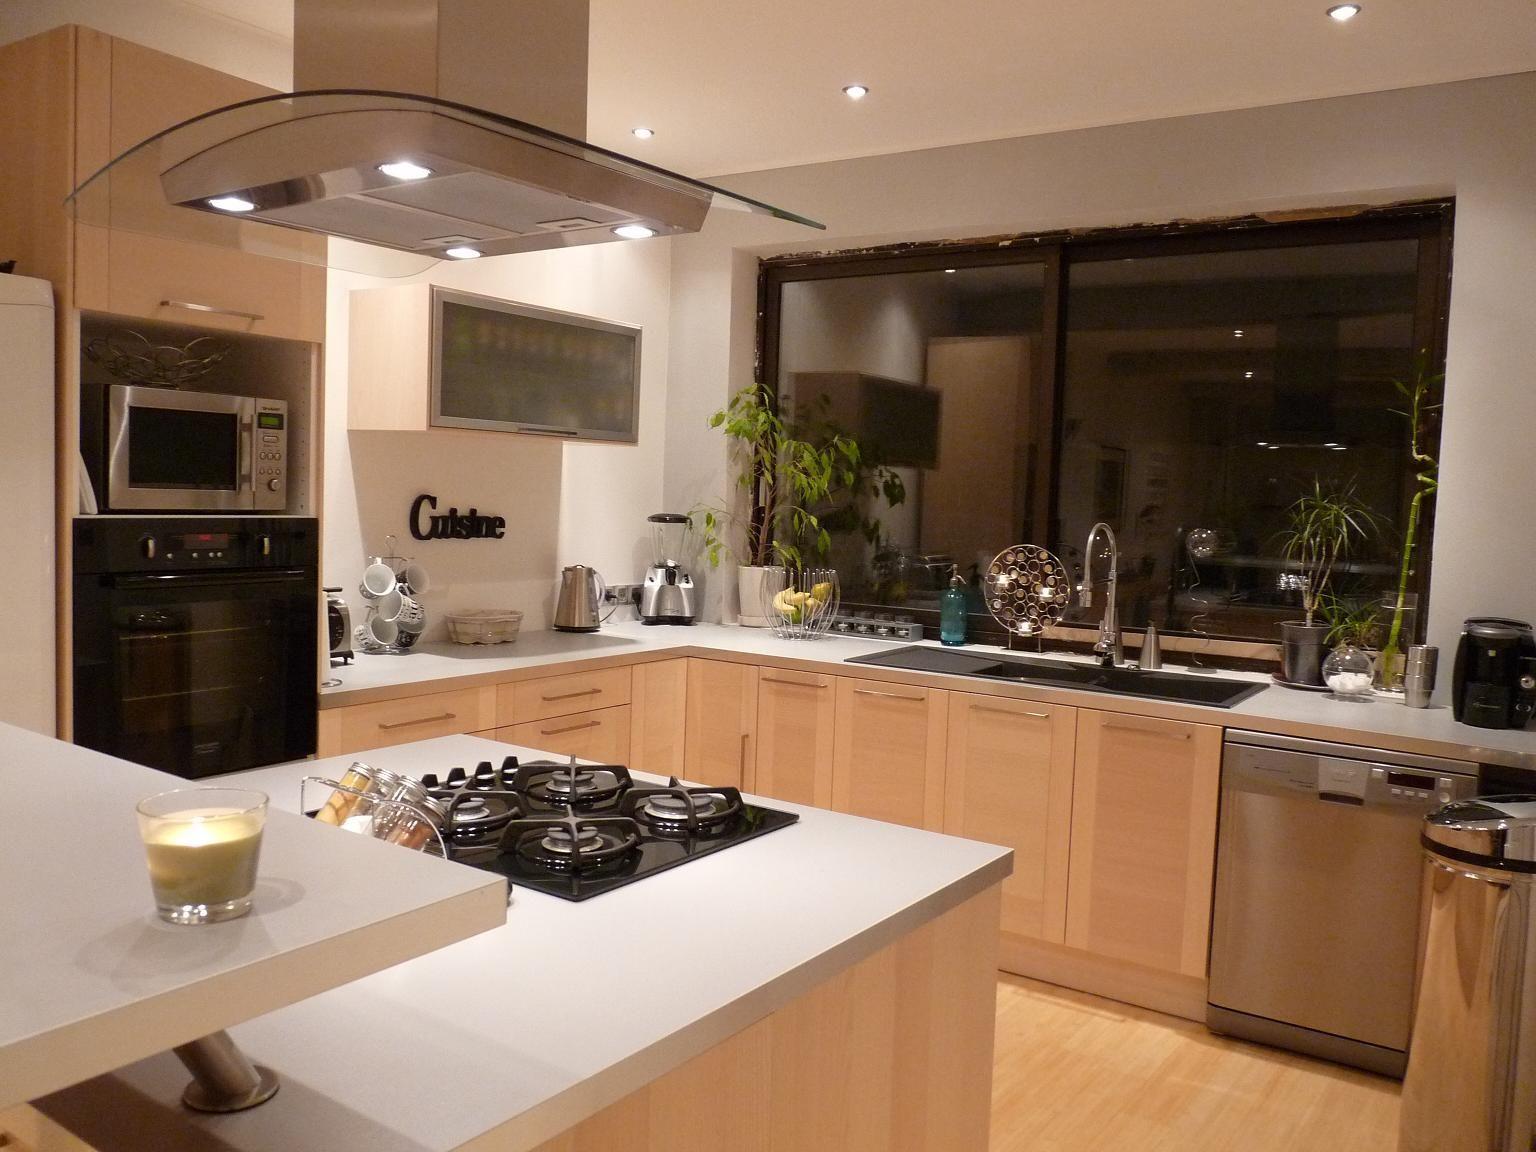 image gallery la cuisine